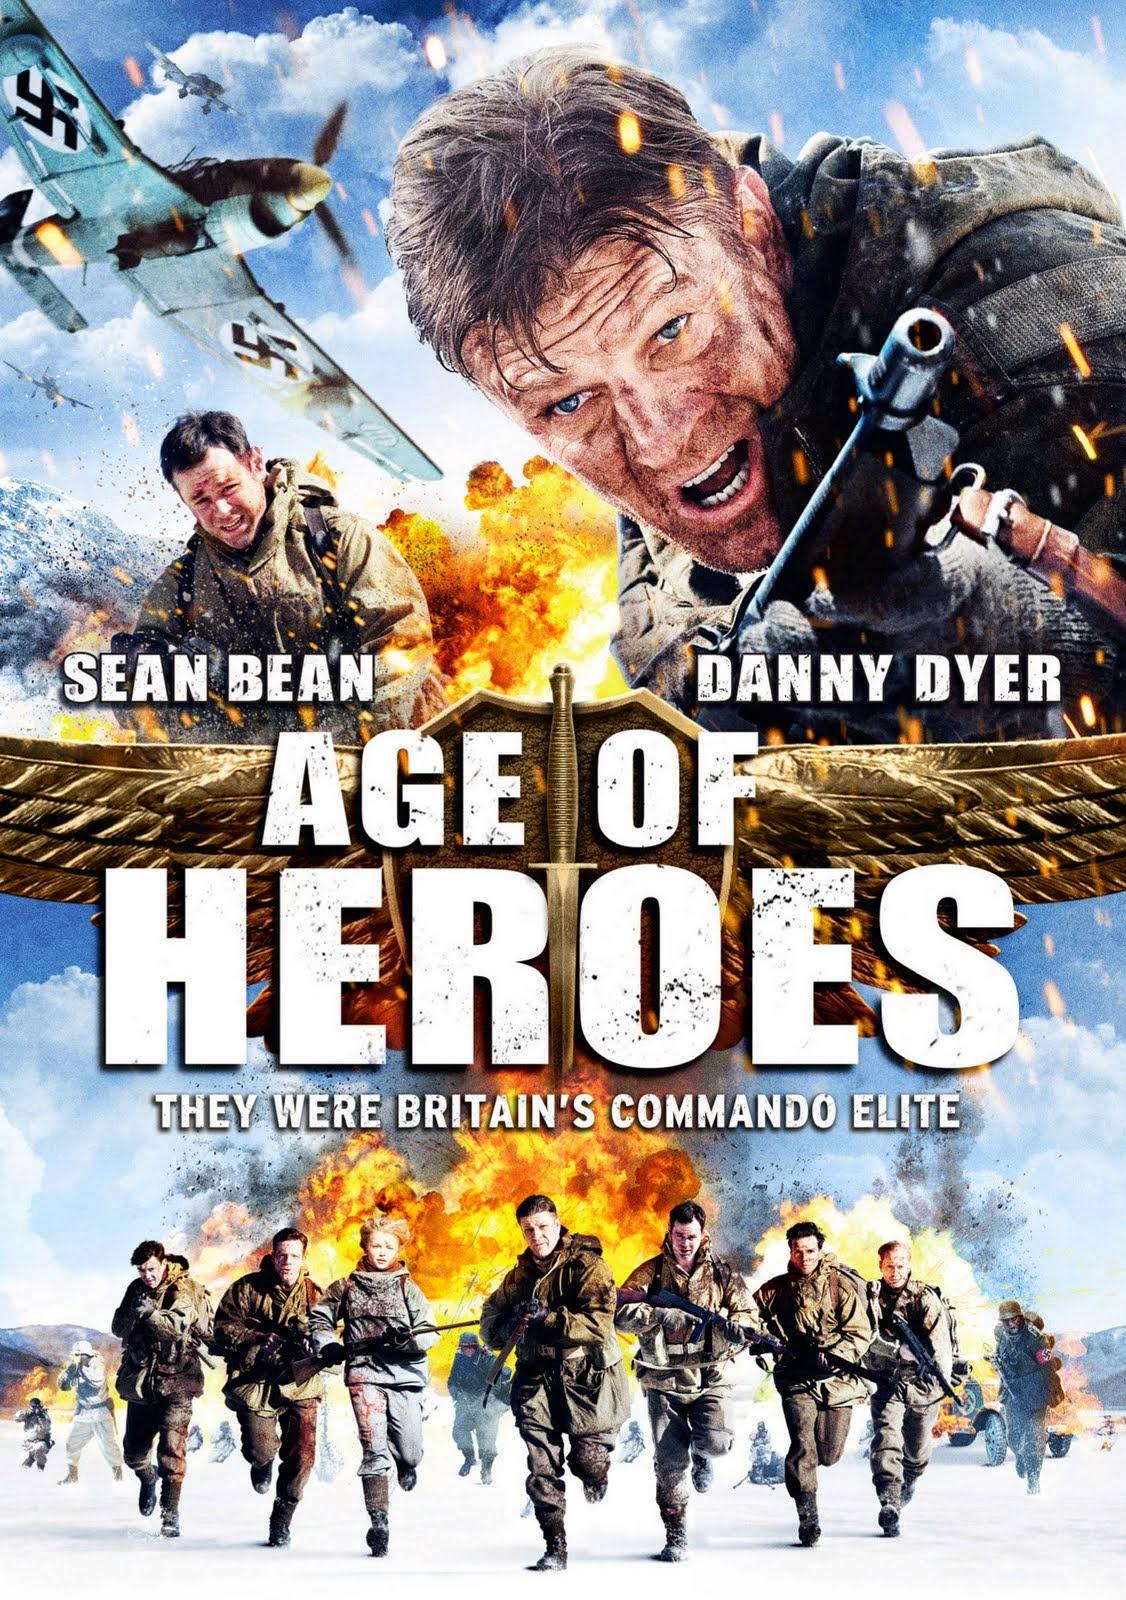 Age of Heroes แหกด่านข้าศึกนรกประจัญบาน [HD]